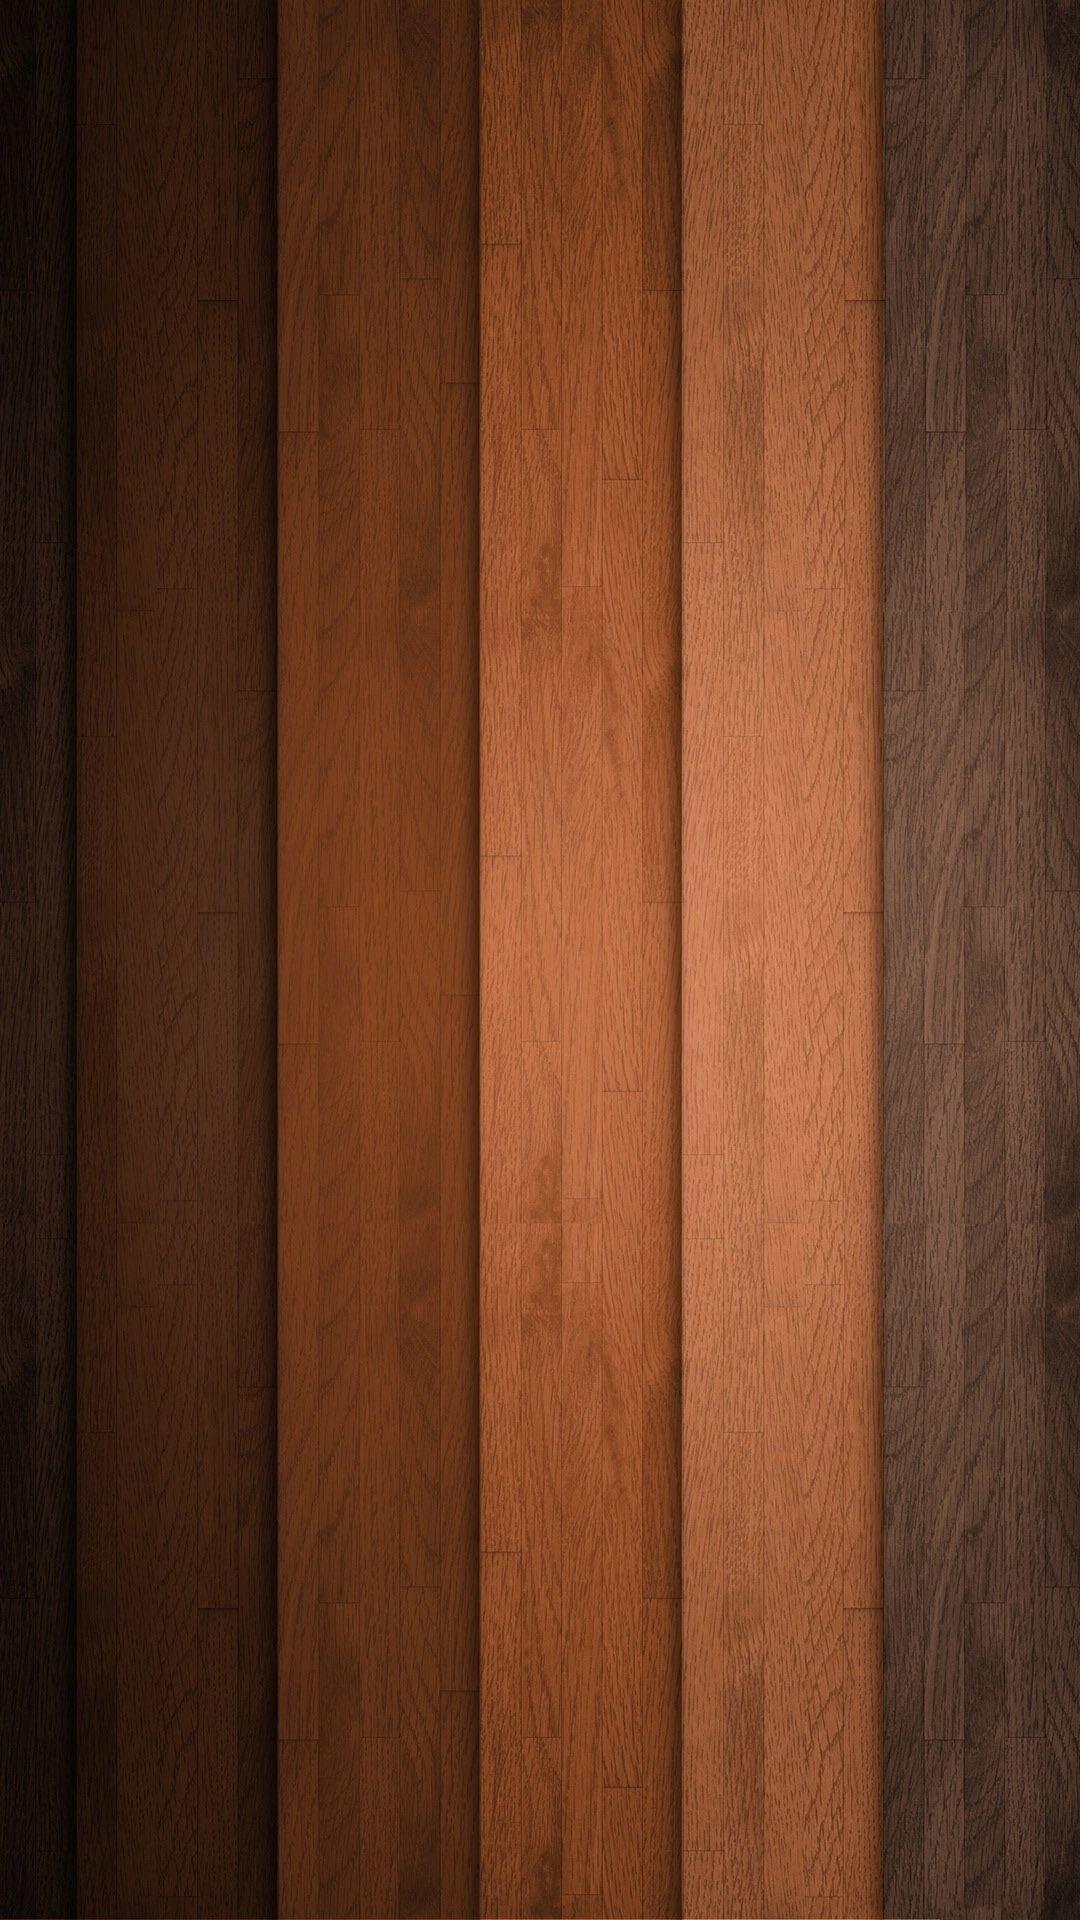 Wood phone wallpaper hd